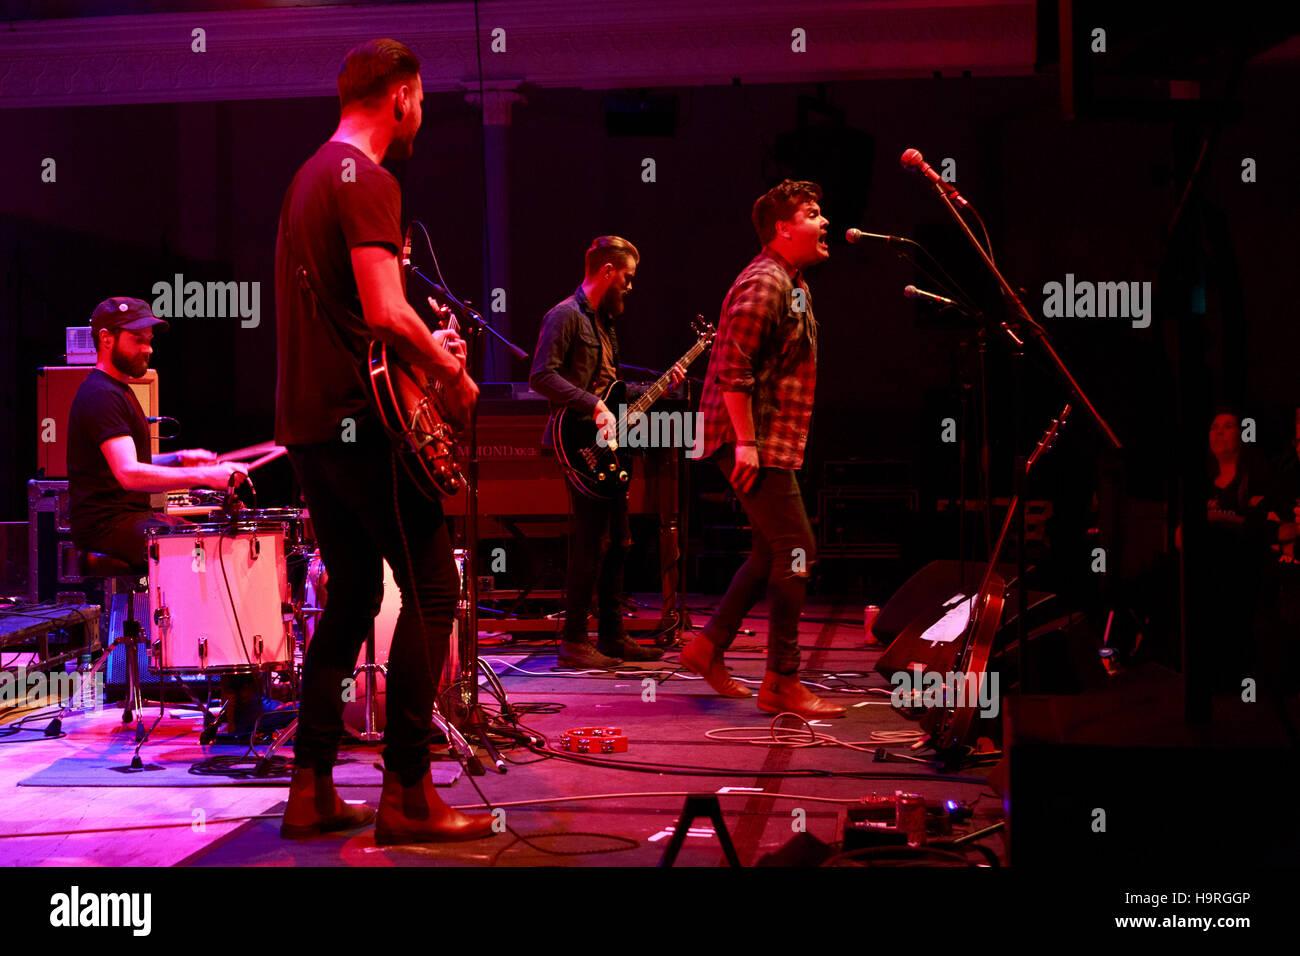 Edinburgh, UK. 25th November 2016. Broken Witt Rebels performs on stage at the Edinburgh Queen's Hall. Pako - Stock Image